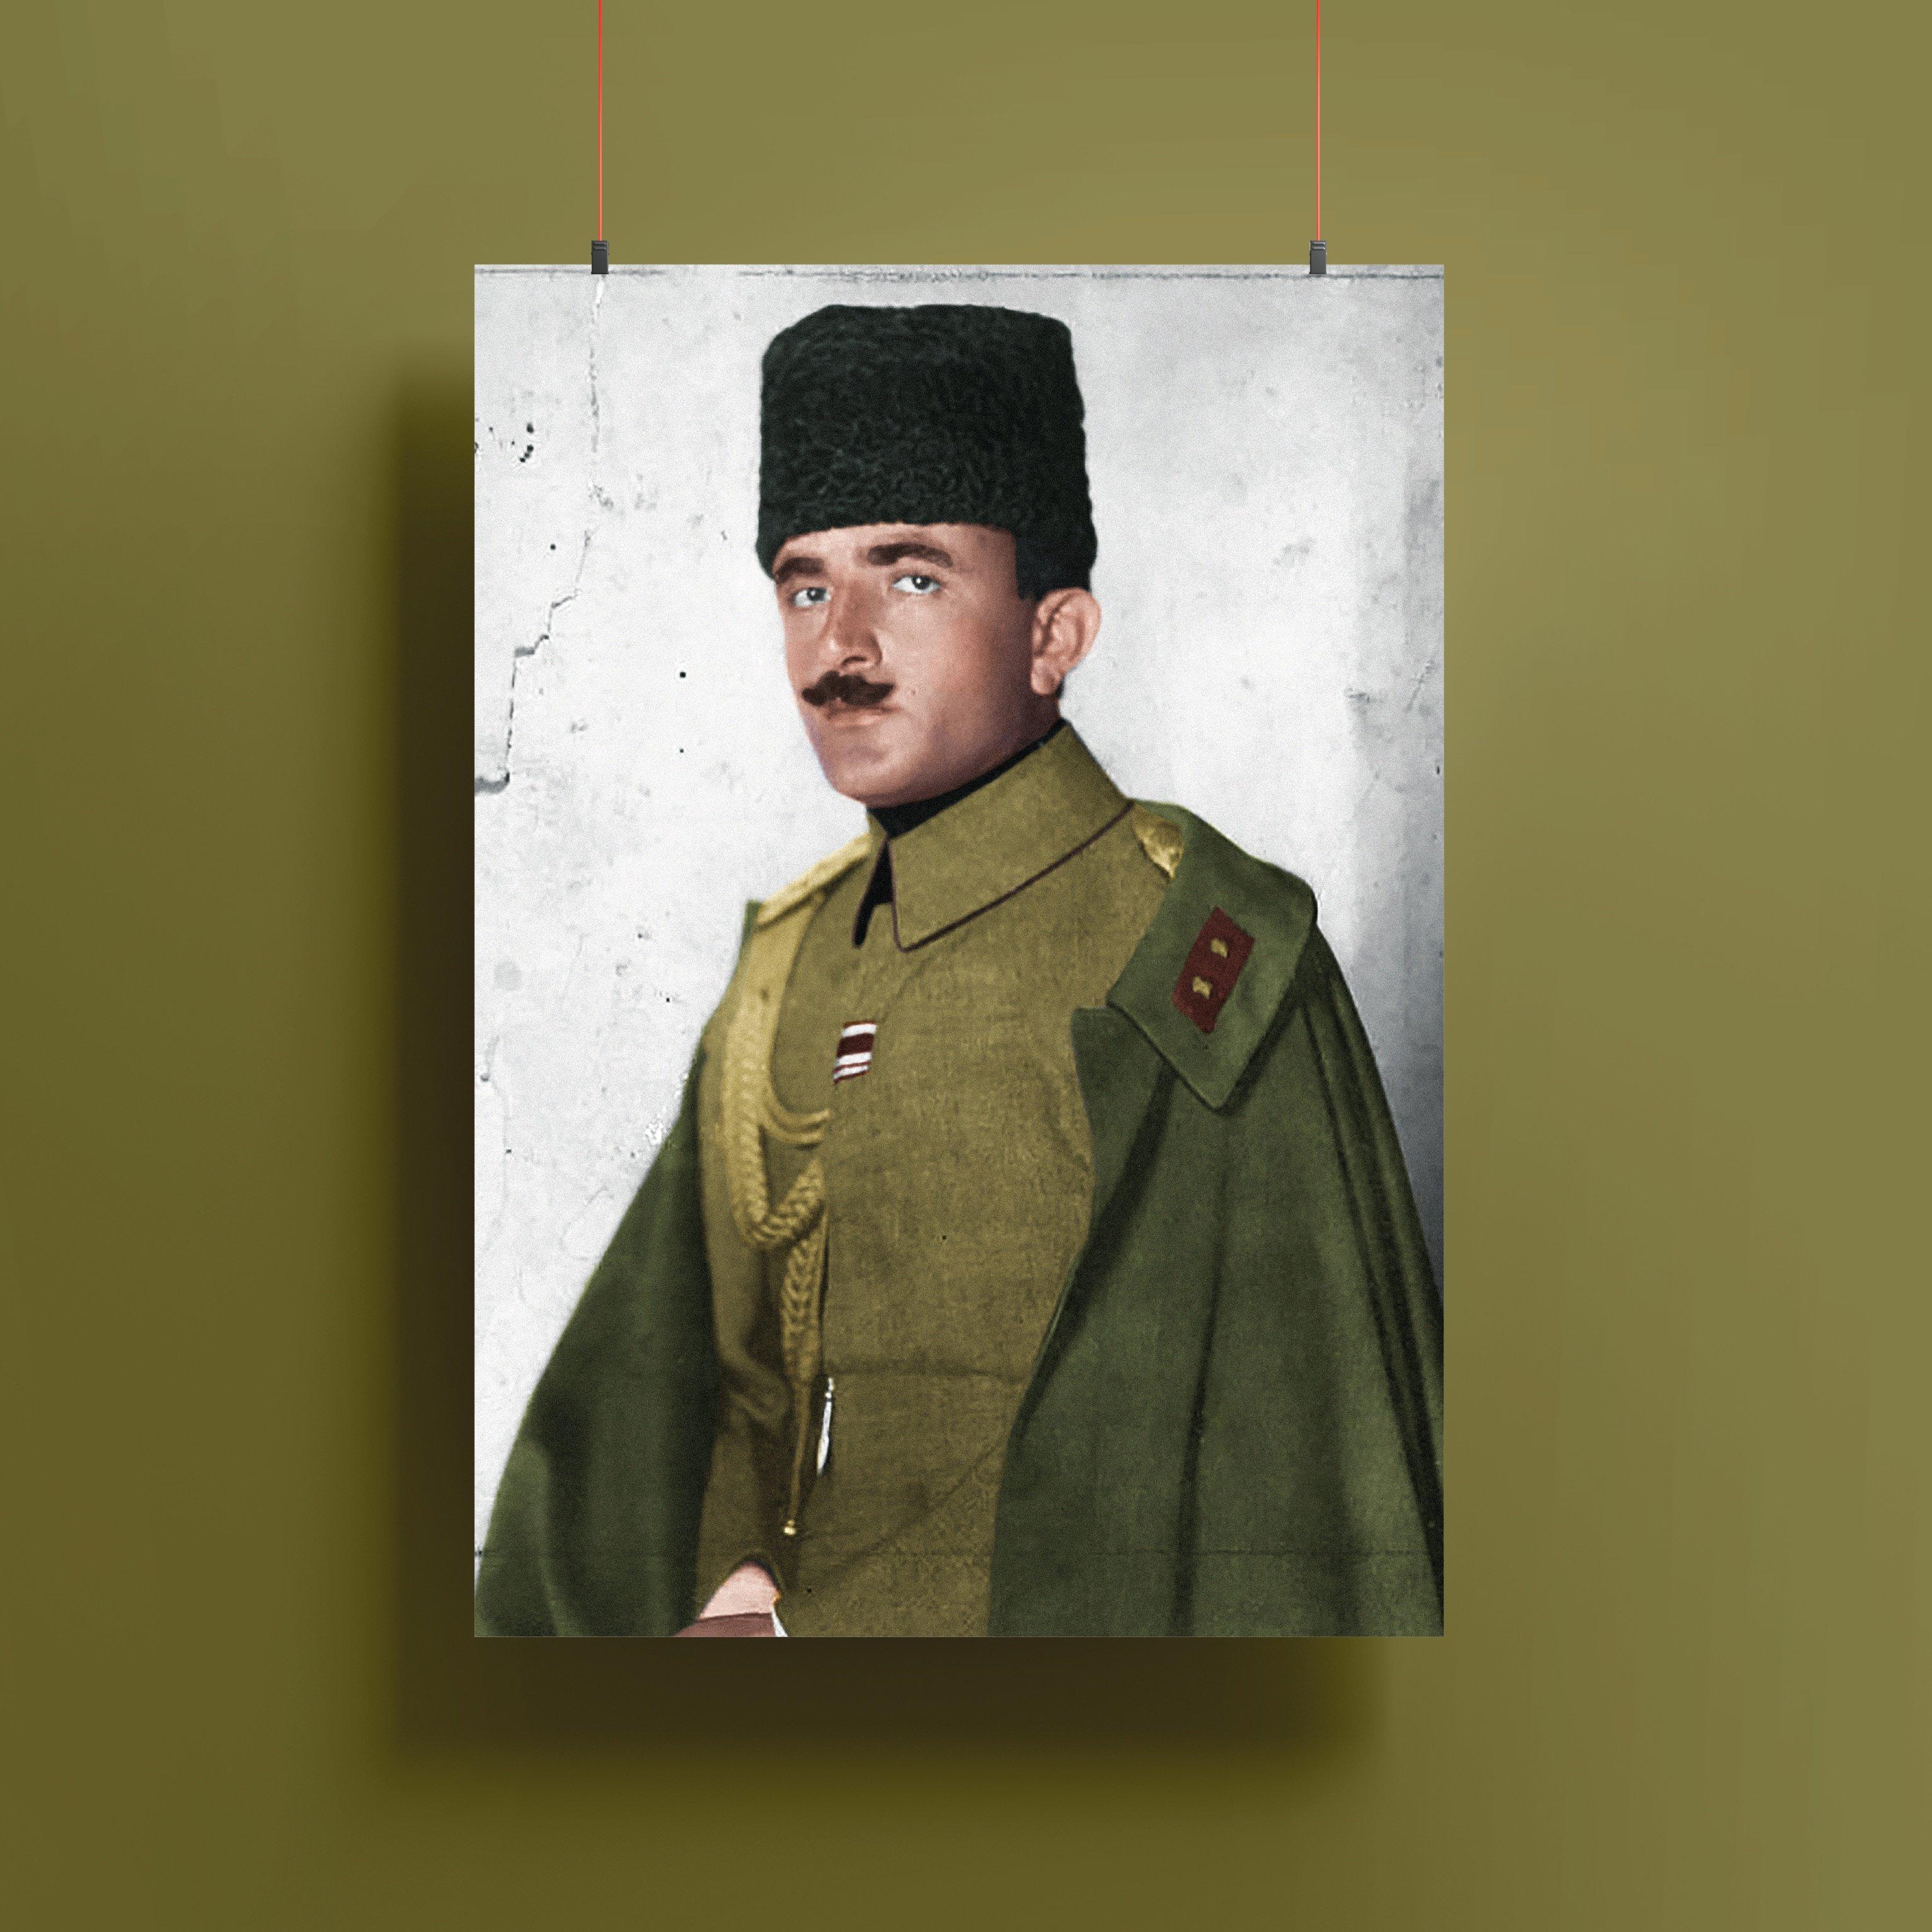 Enver Paşa Renklendirme Poster - 2